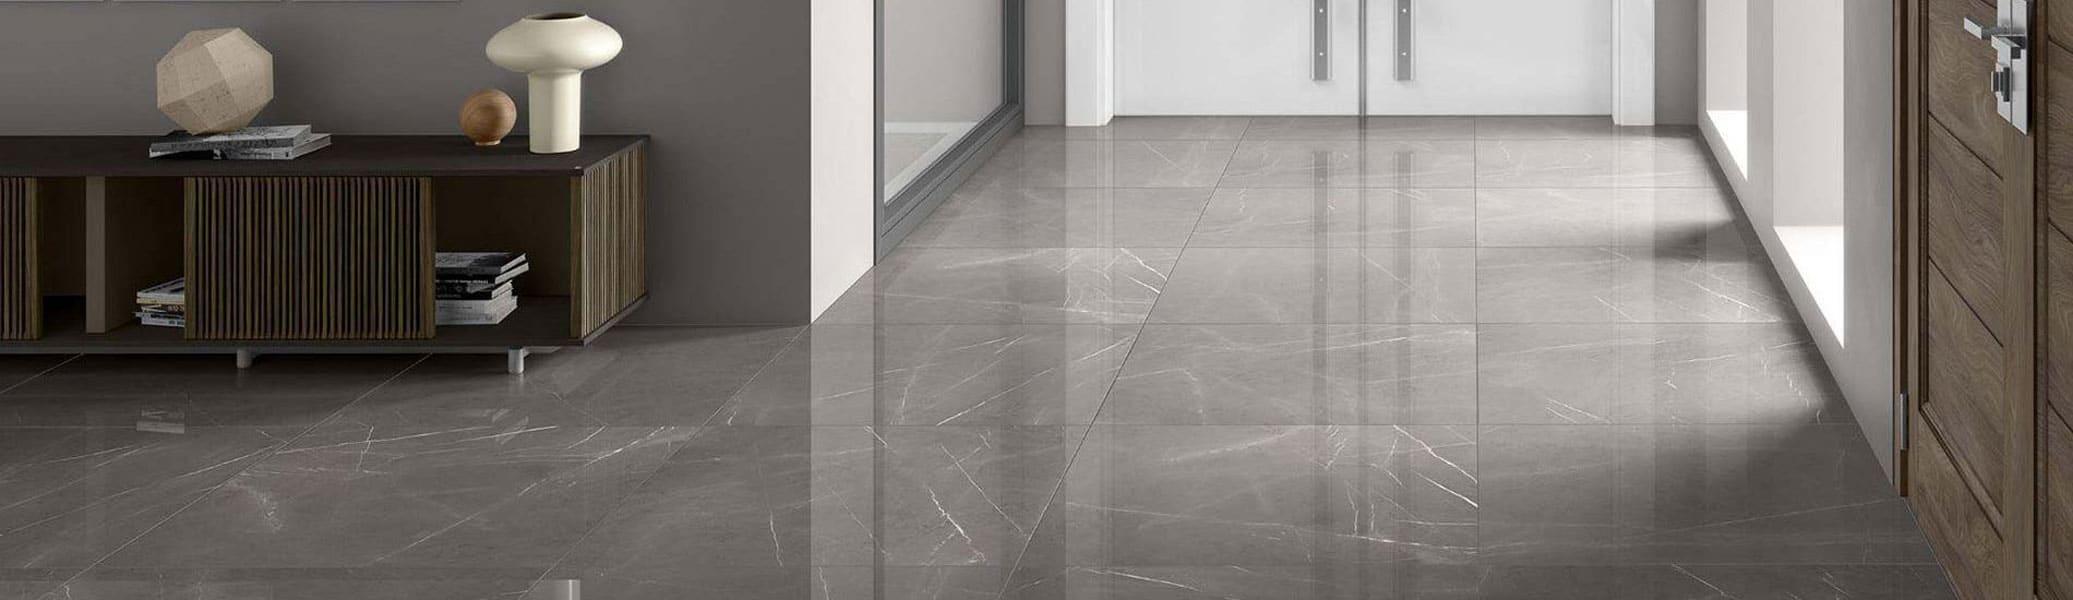 banner-marble-spanish-marble-look-deco-floor-wall-tile-newker-anaheim-1900x550